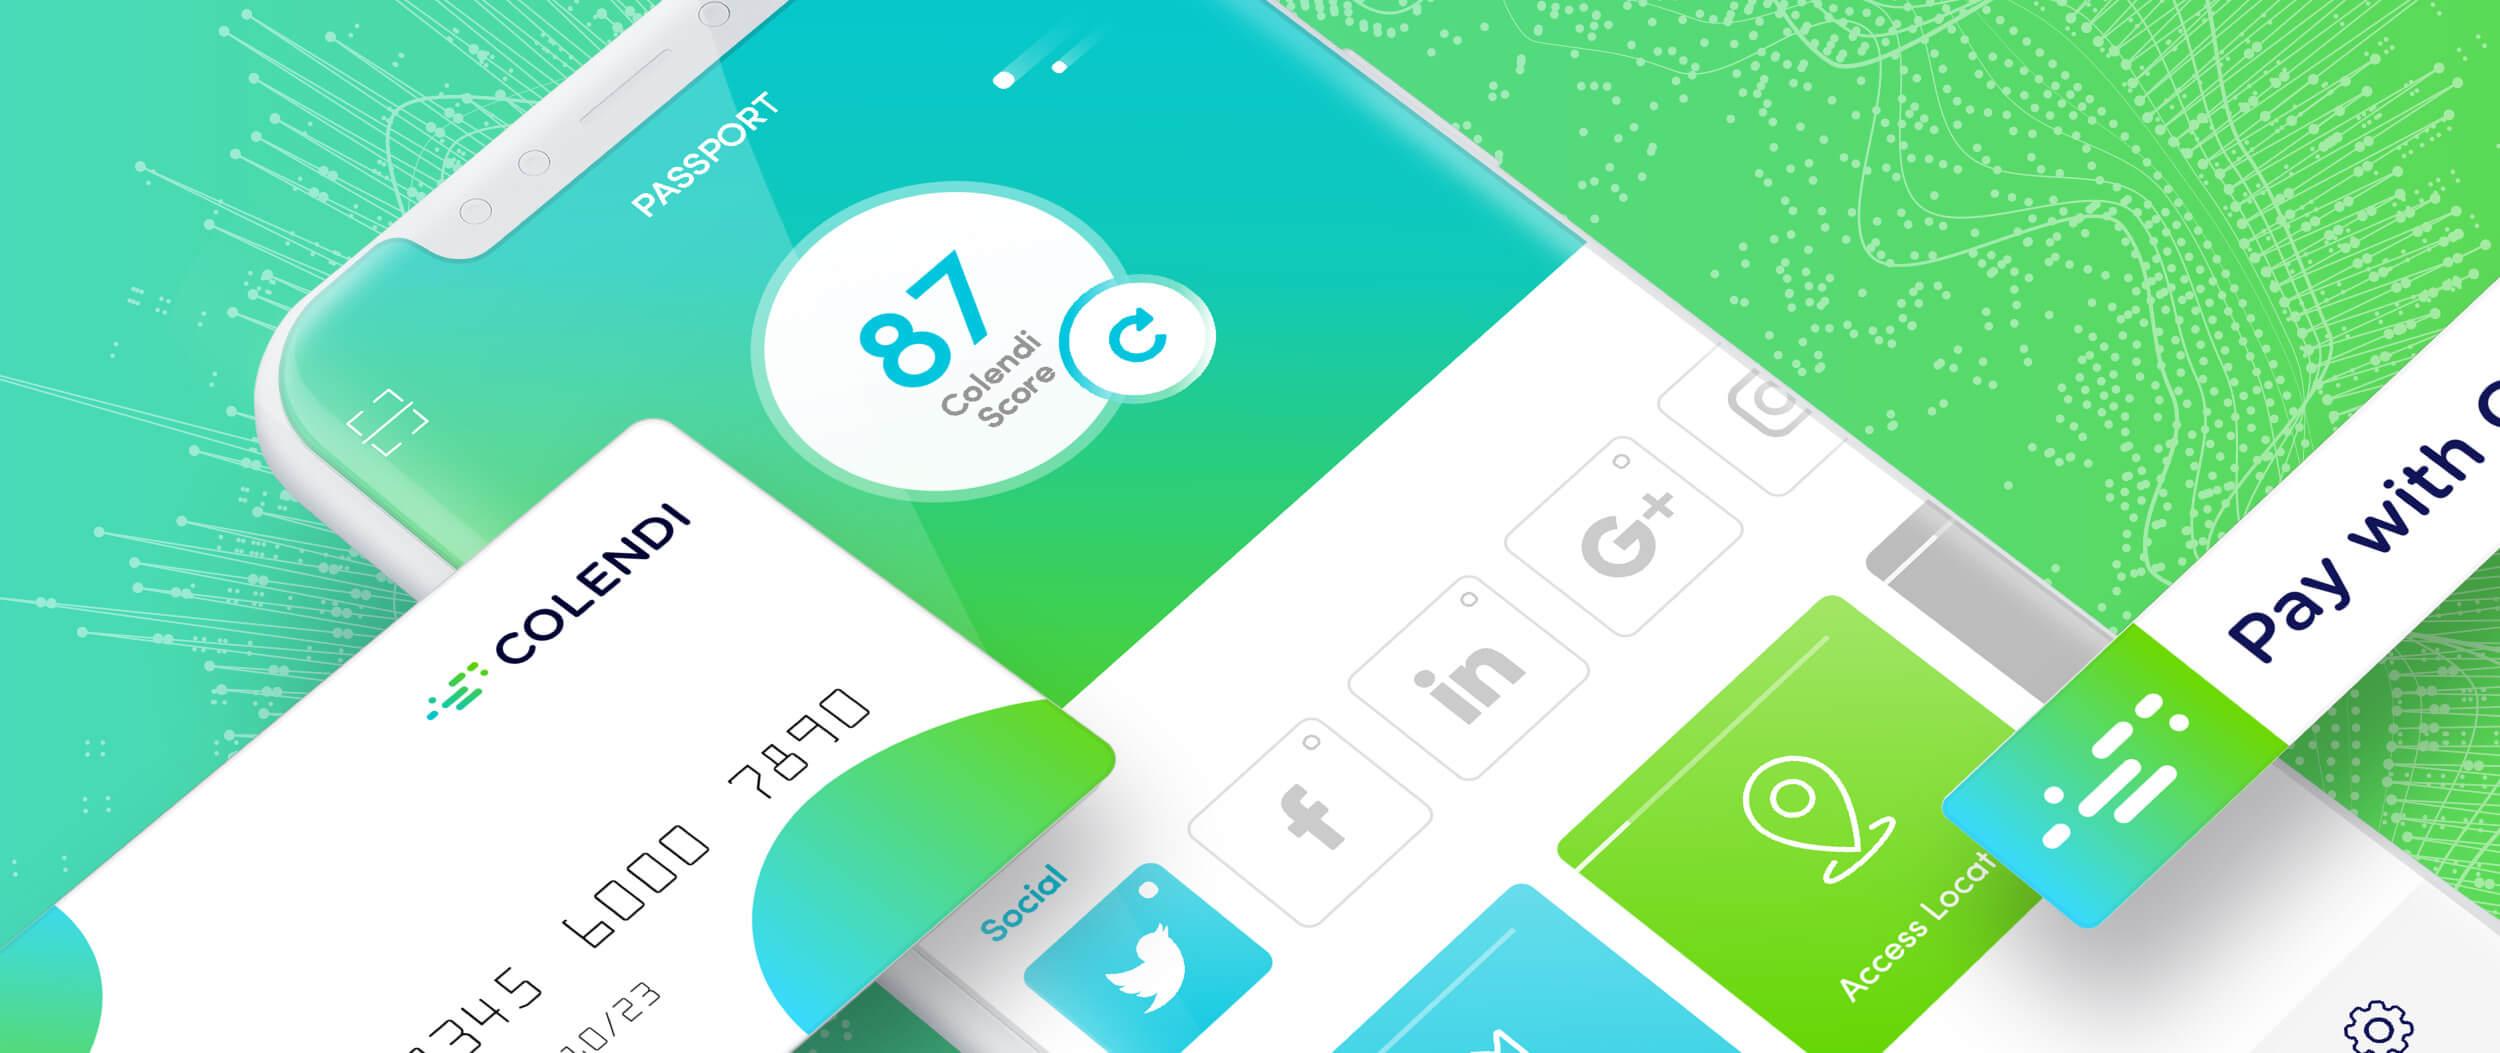 Colendi re-branding & mobile app user experience design